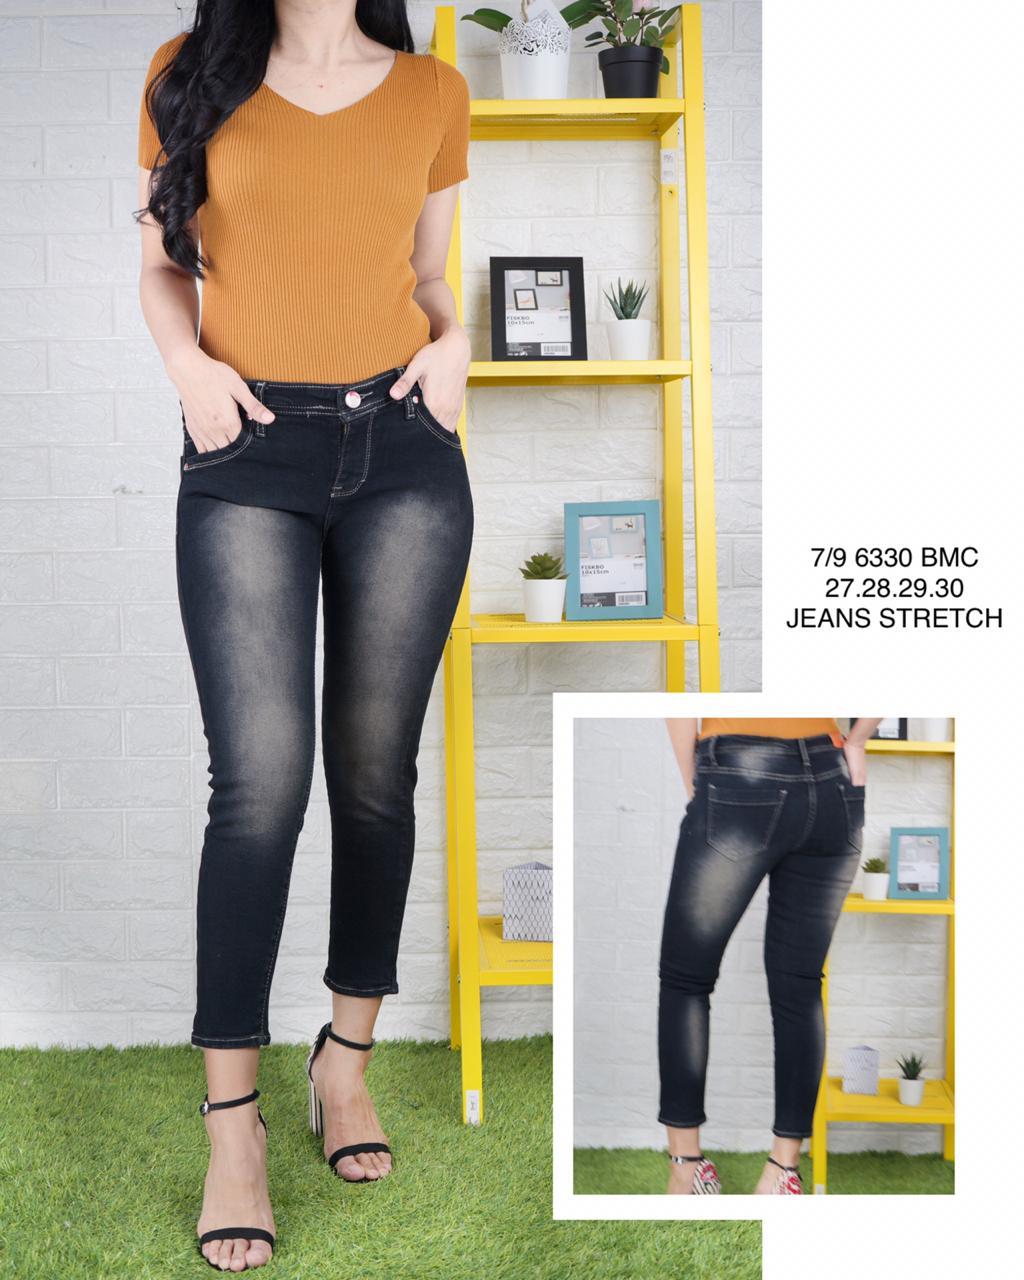 Celana Jeans Wanita Celana Jeans Wanita Tulang 7 9 Celana Jeans Model Terbaru Celana Pensil Wanita Kekinian Lazada Indonesia